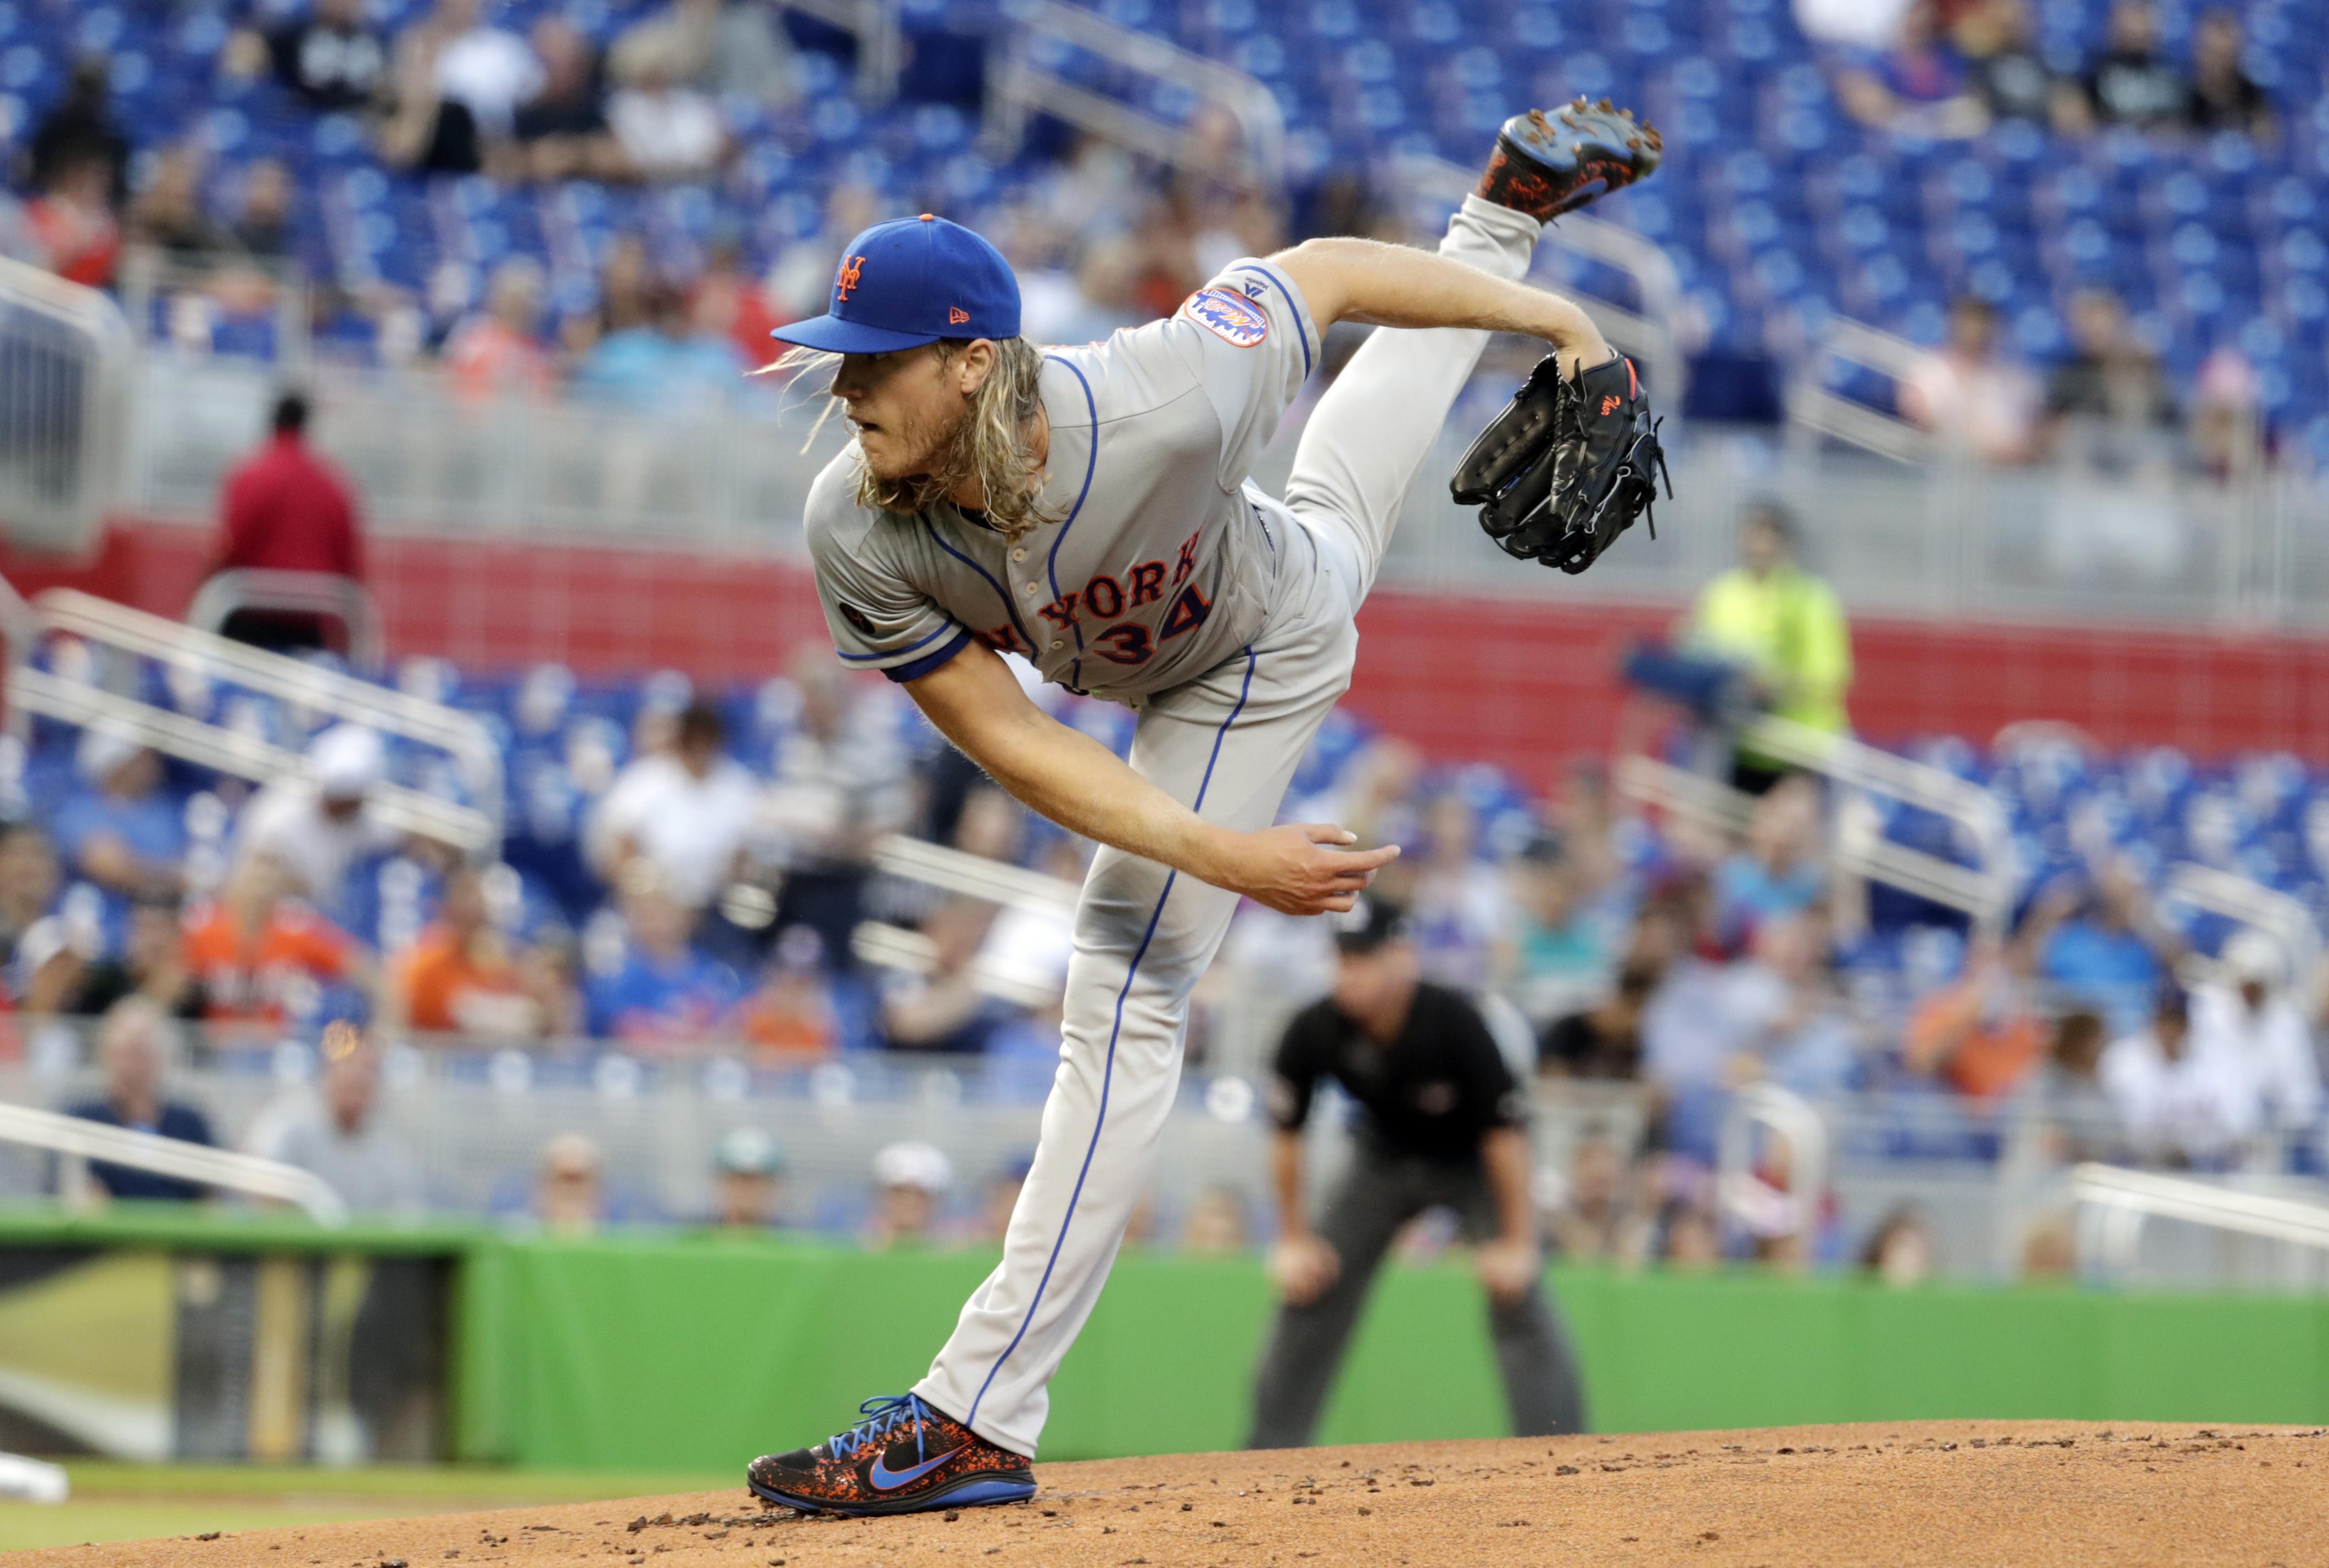 Mets_marlins_baseball_83581